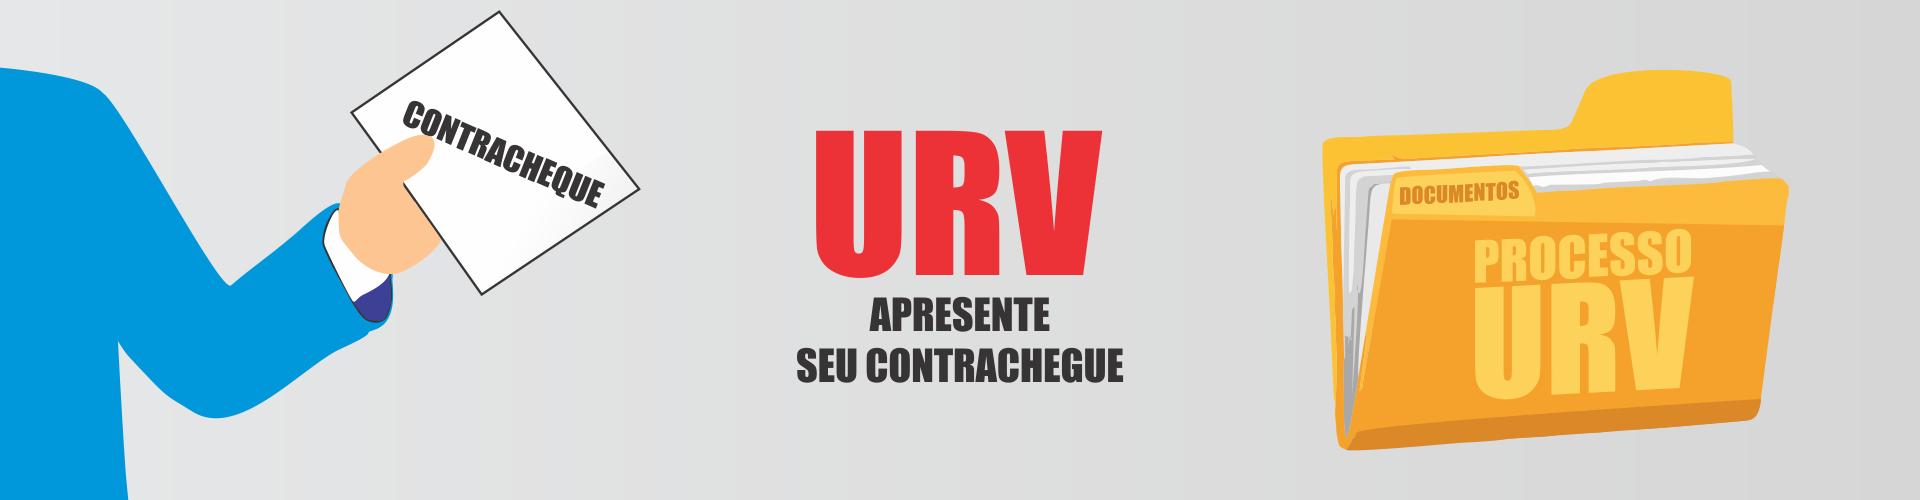 Contracheque para URV